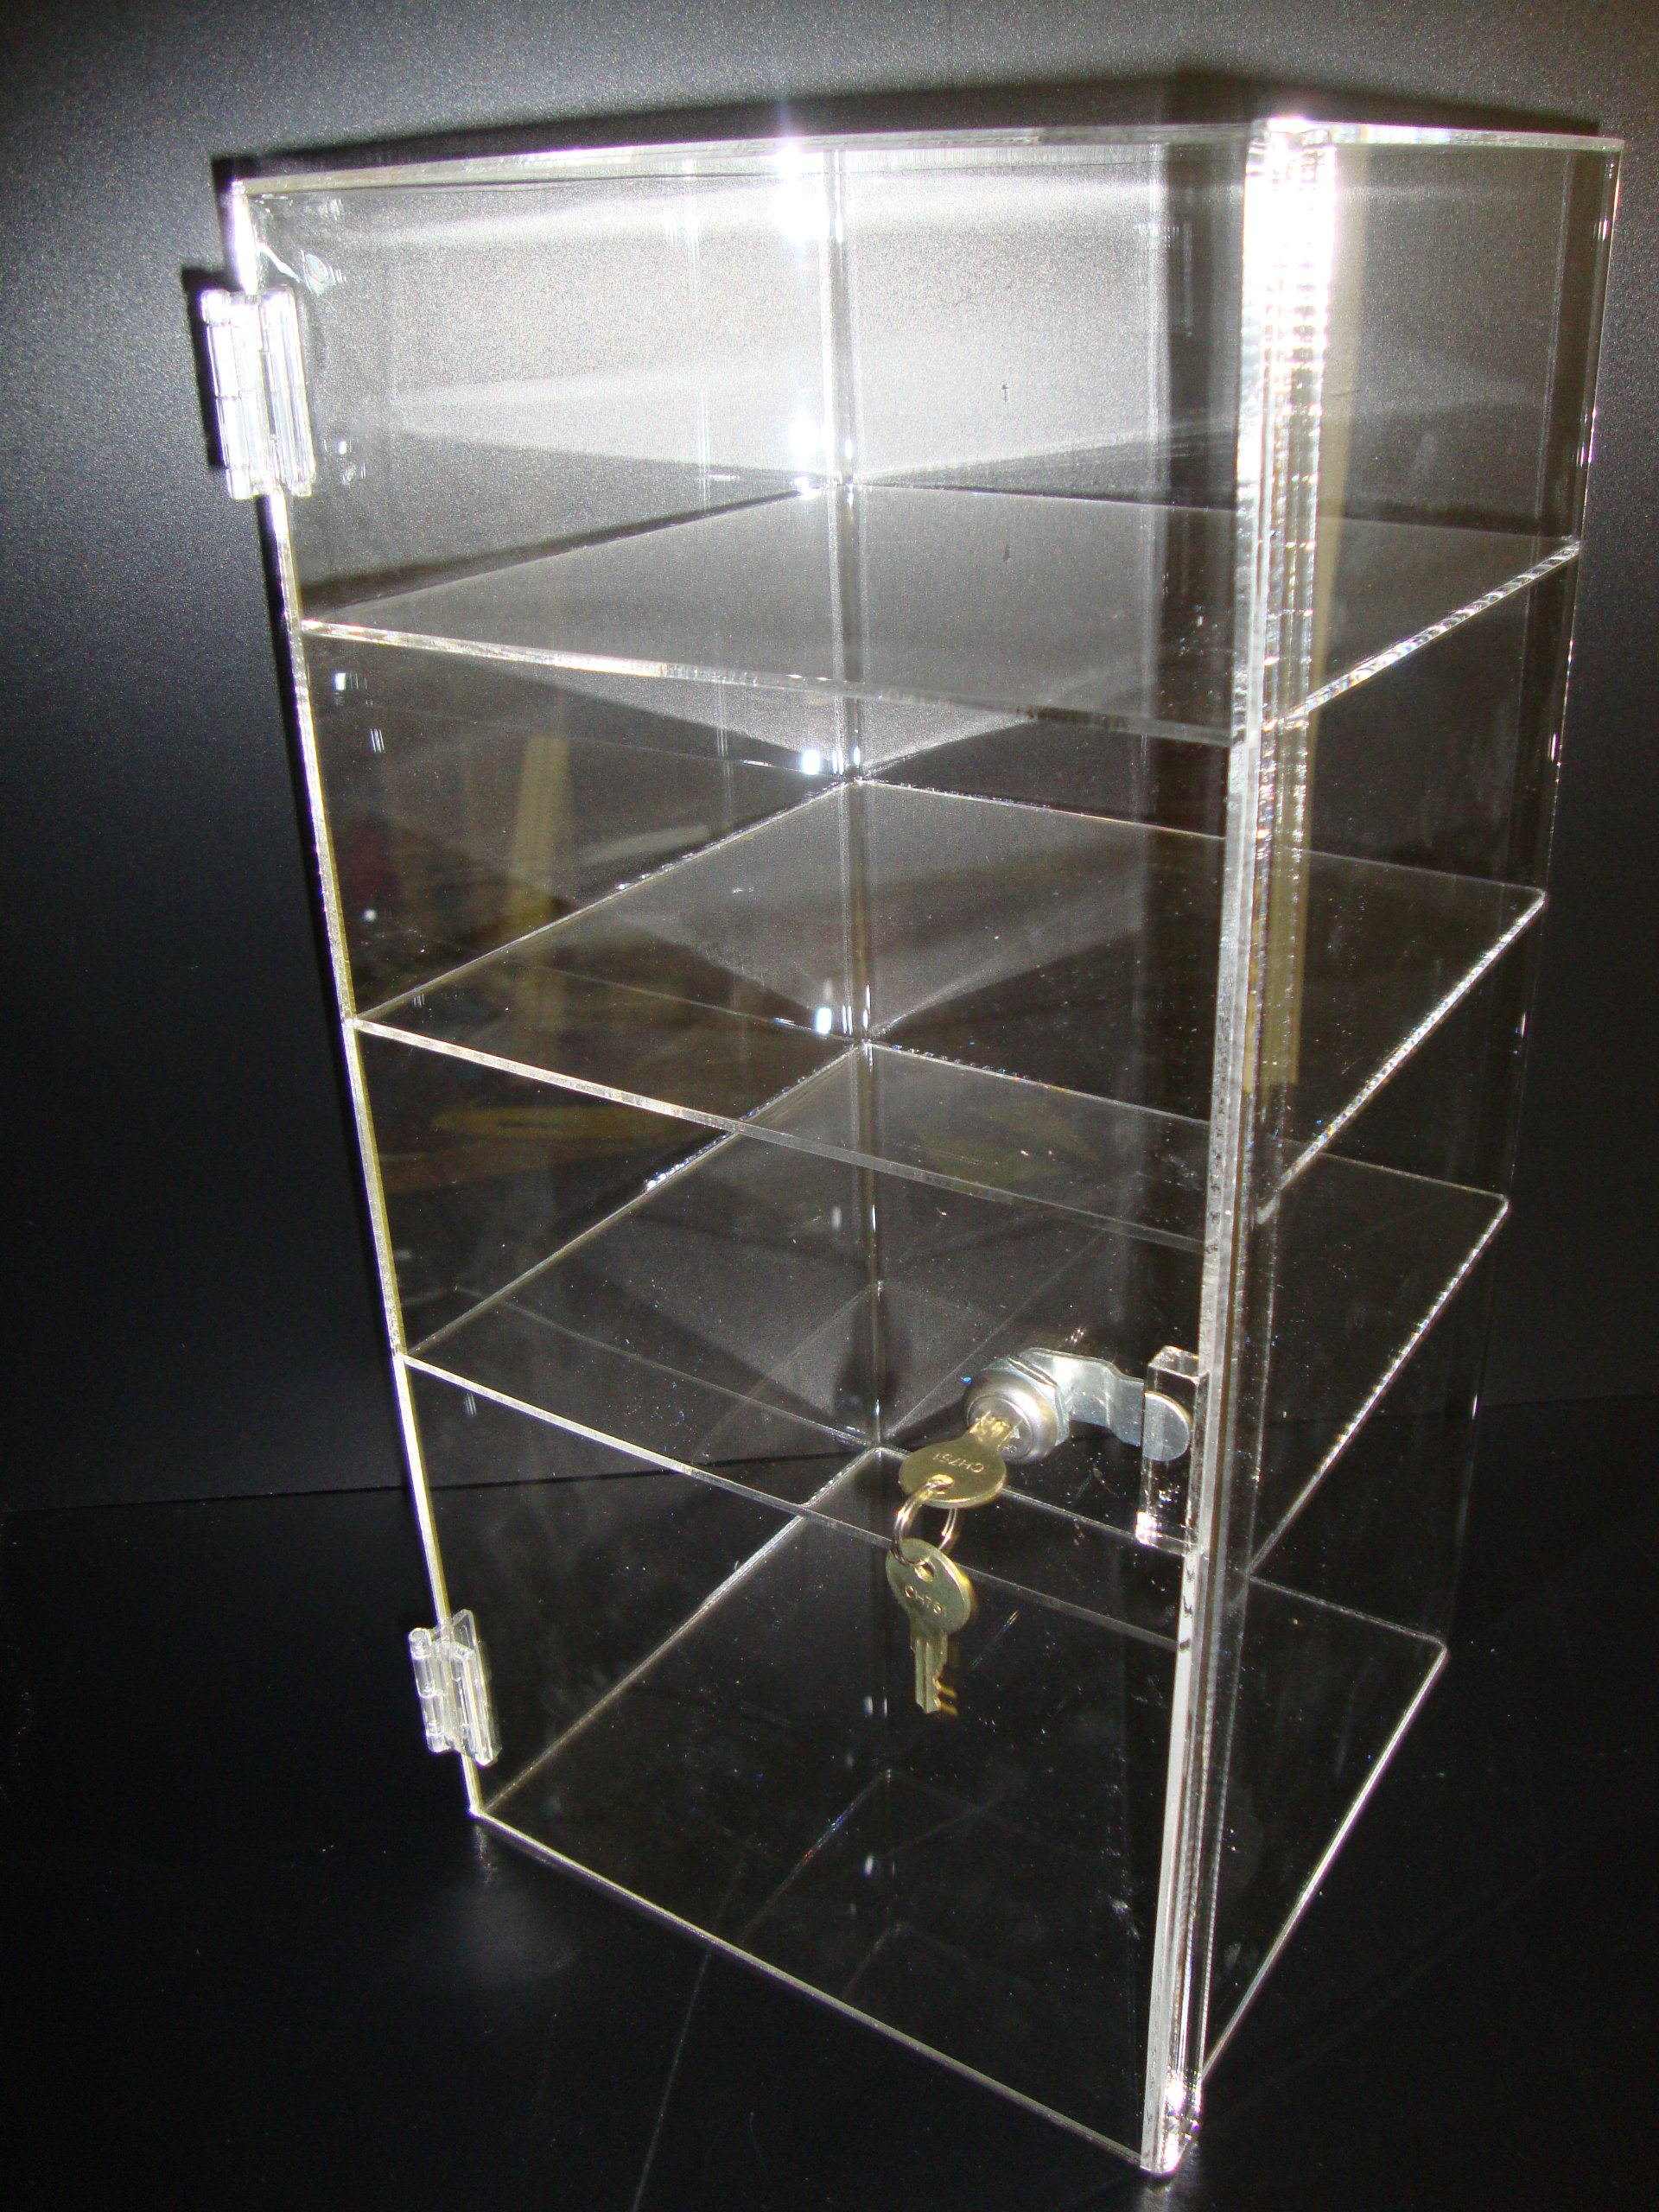 LuciteDisplay Acrylic Lucite Showcase Jewelry Pastry Bakery Counter Display W/door & Lock (9 1/2'' x 9 1/2'' x 19''H)